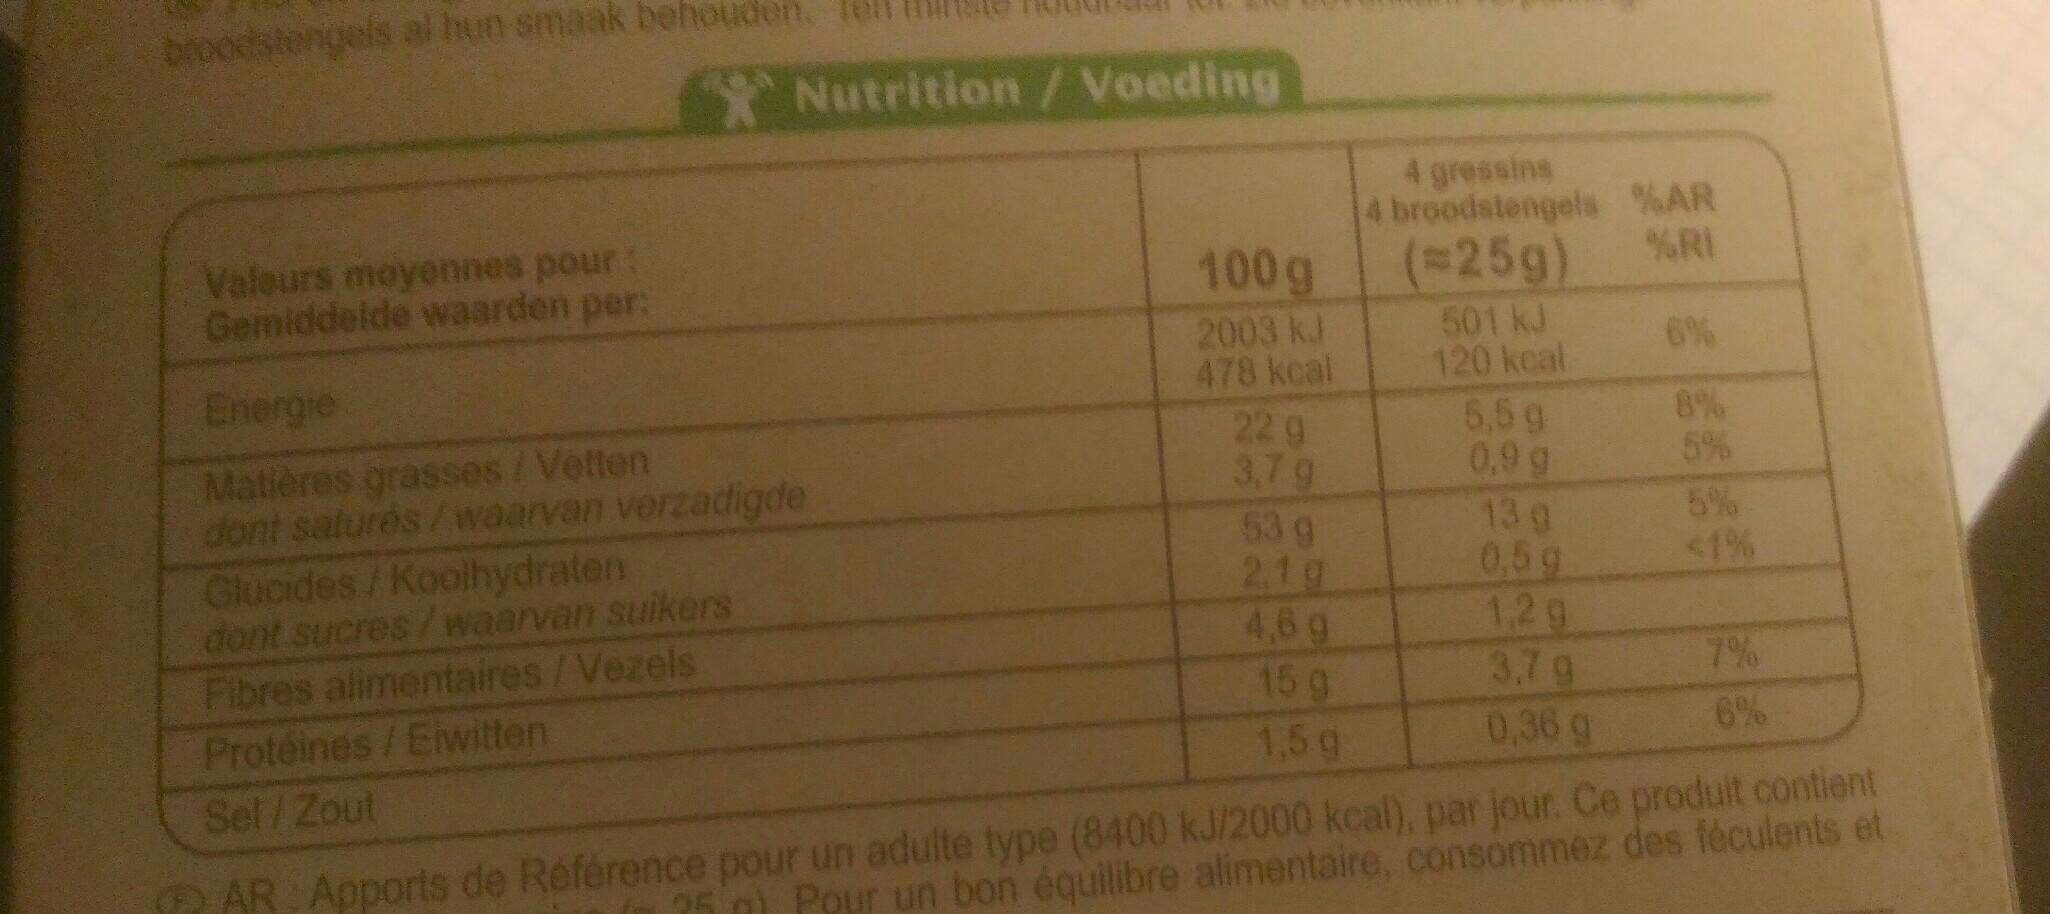 Gressins au sésame et à l'huile d'olive - Voedingswaarden - fr